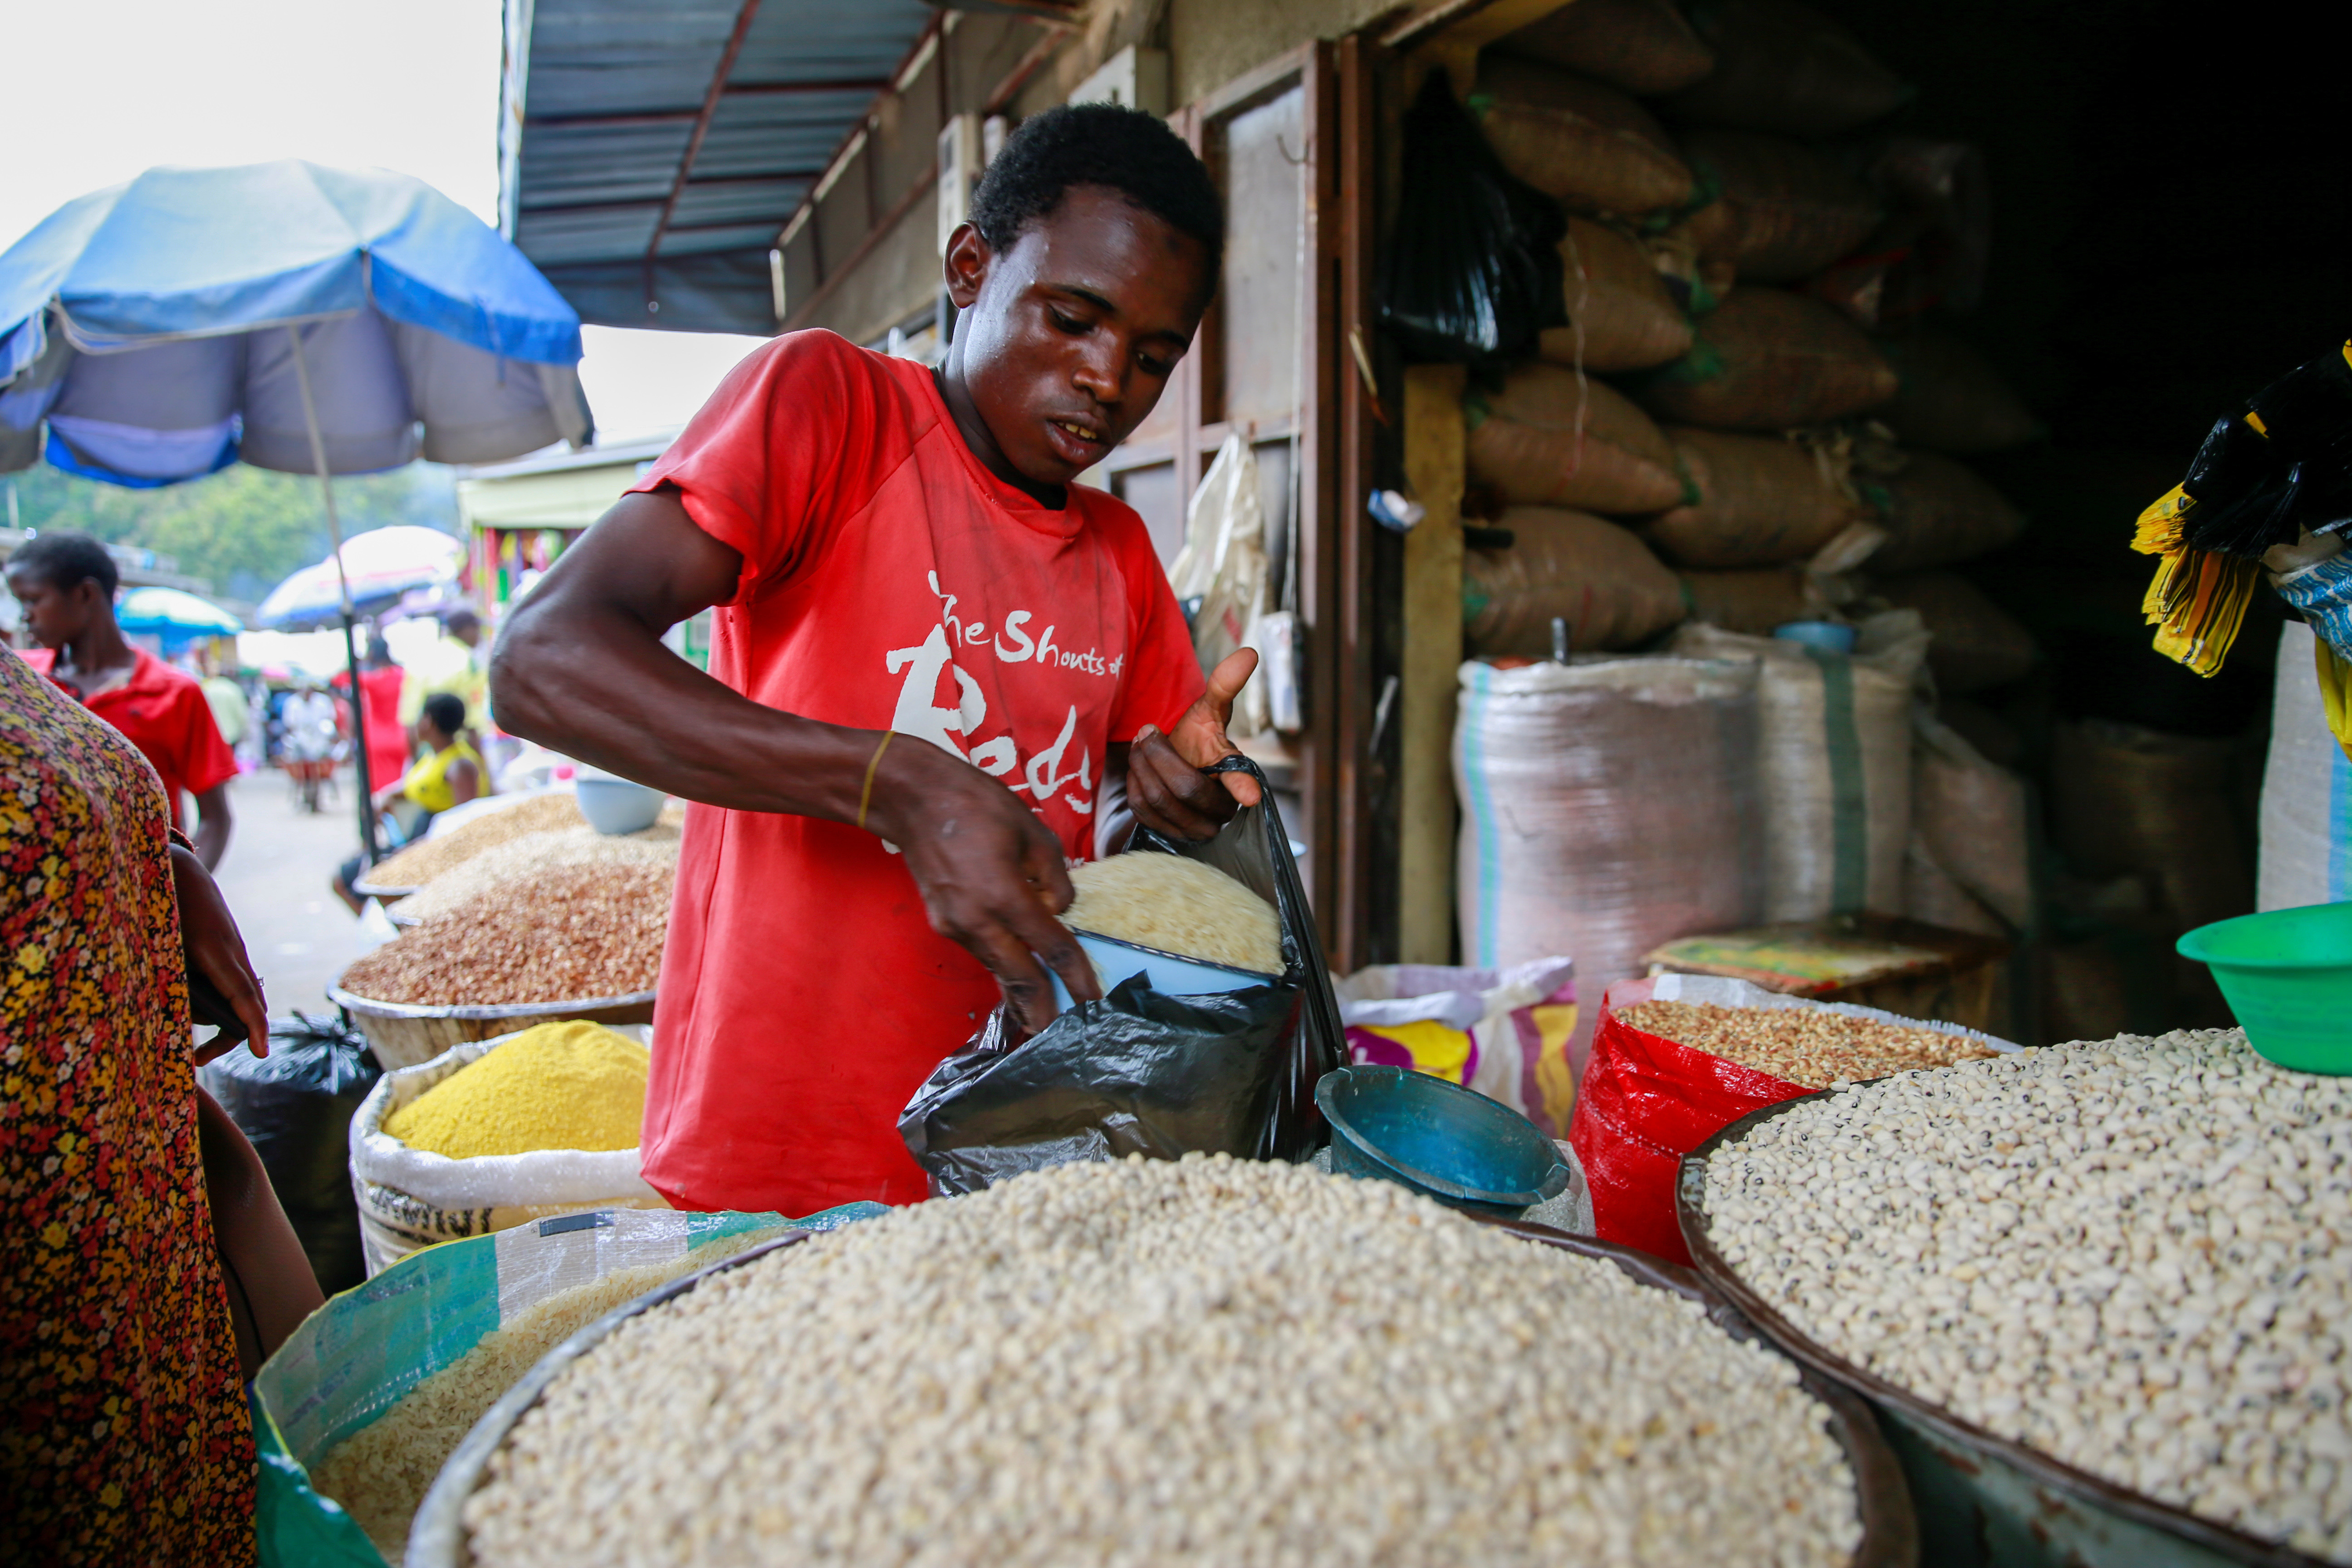 A man measures out a bowl of rice grains into a bag at a grains shop in Garki market Abuja, Nigeria November 13, 2019. Picture taken November 13, 2019.